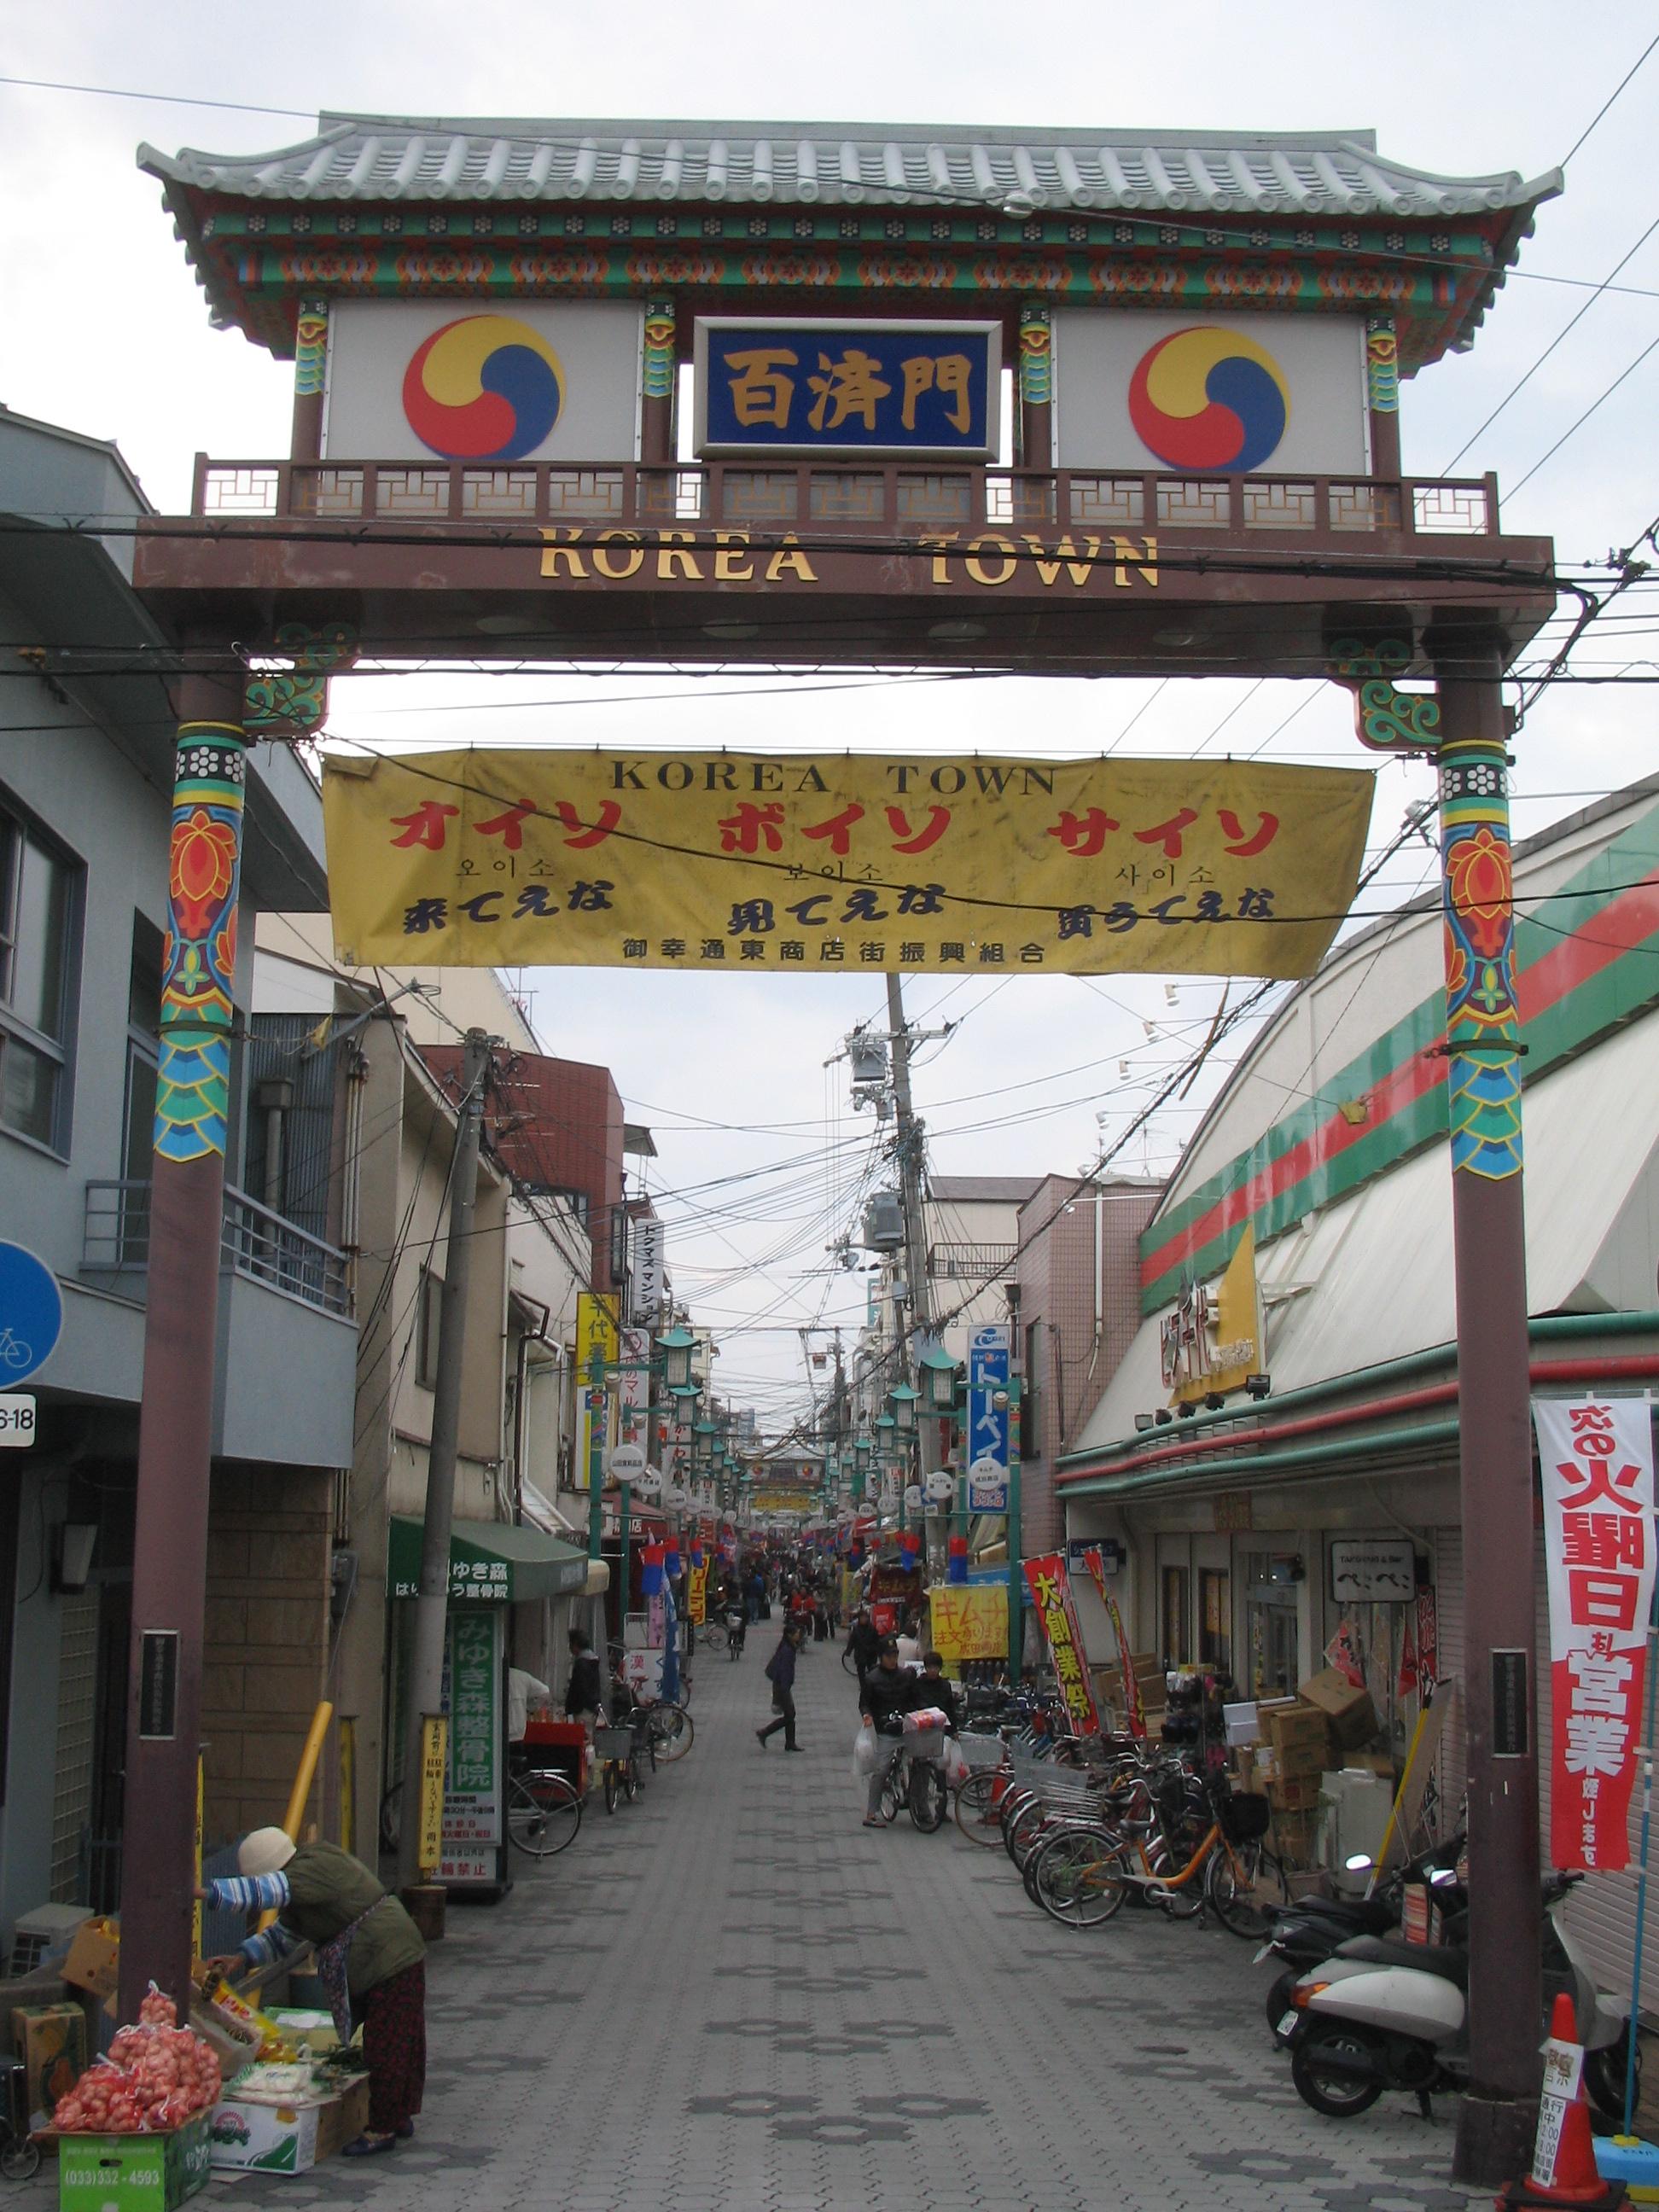 korea town in tsuruhashi osaka seattle english inc